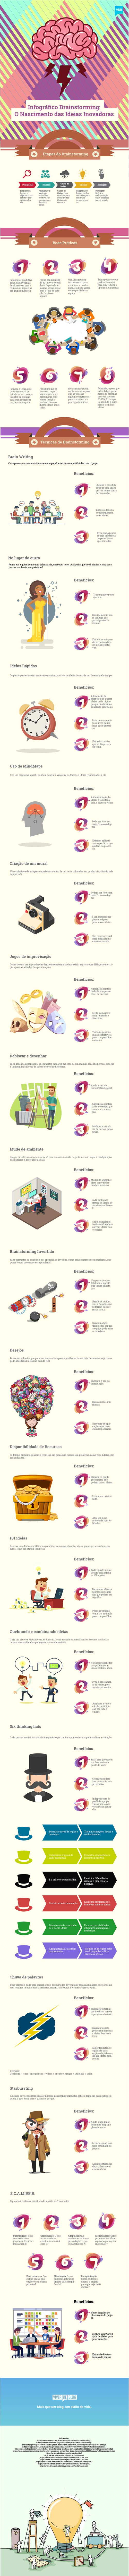 Infografico-Brainstorming